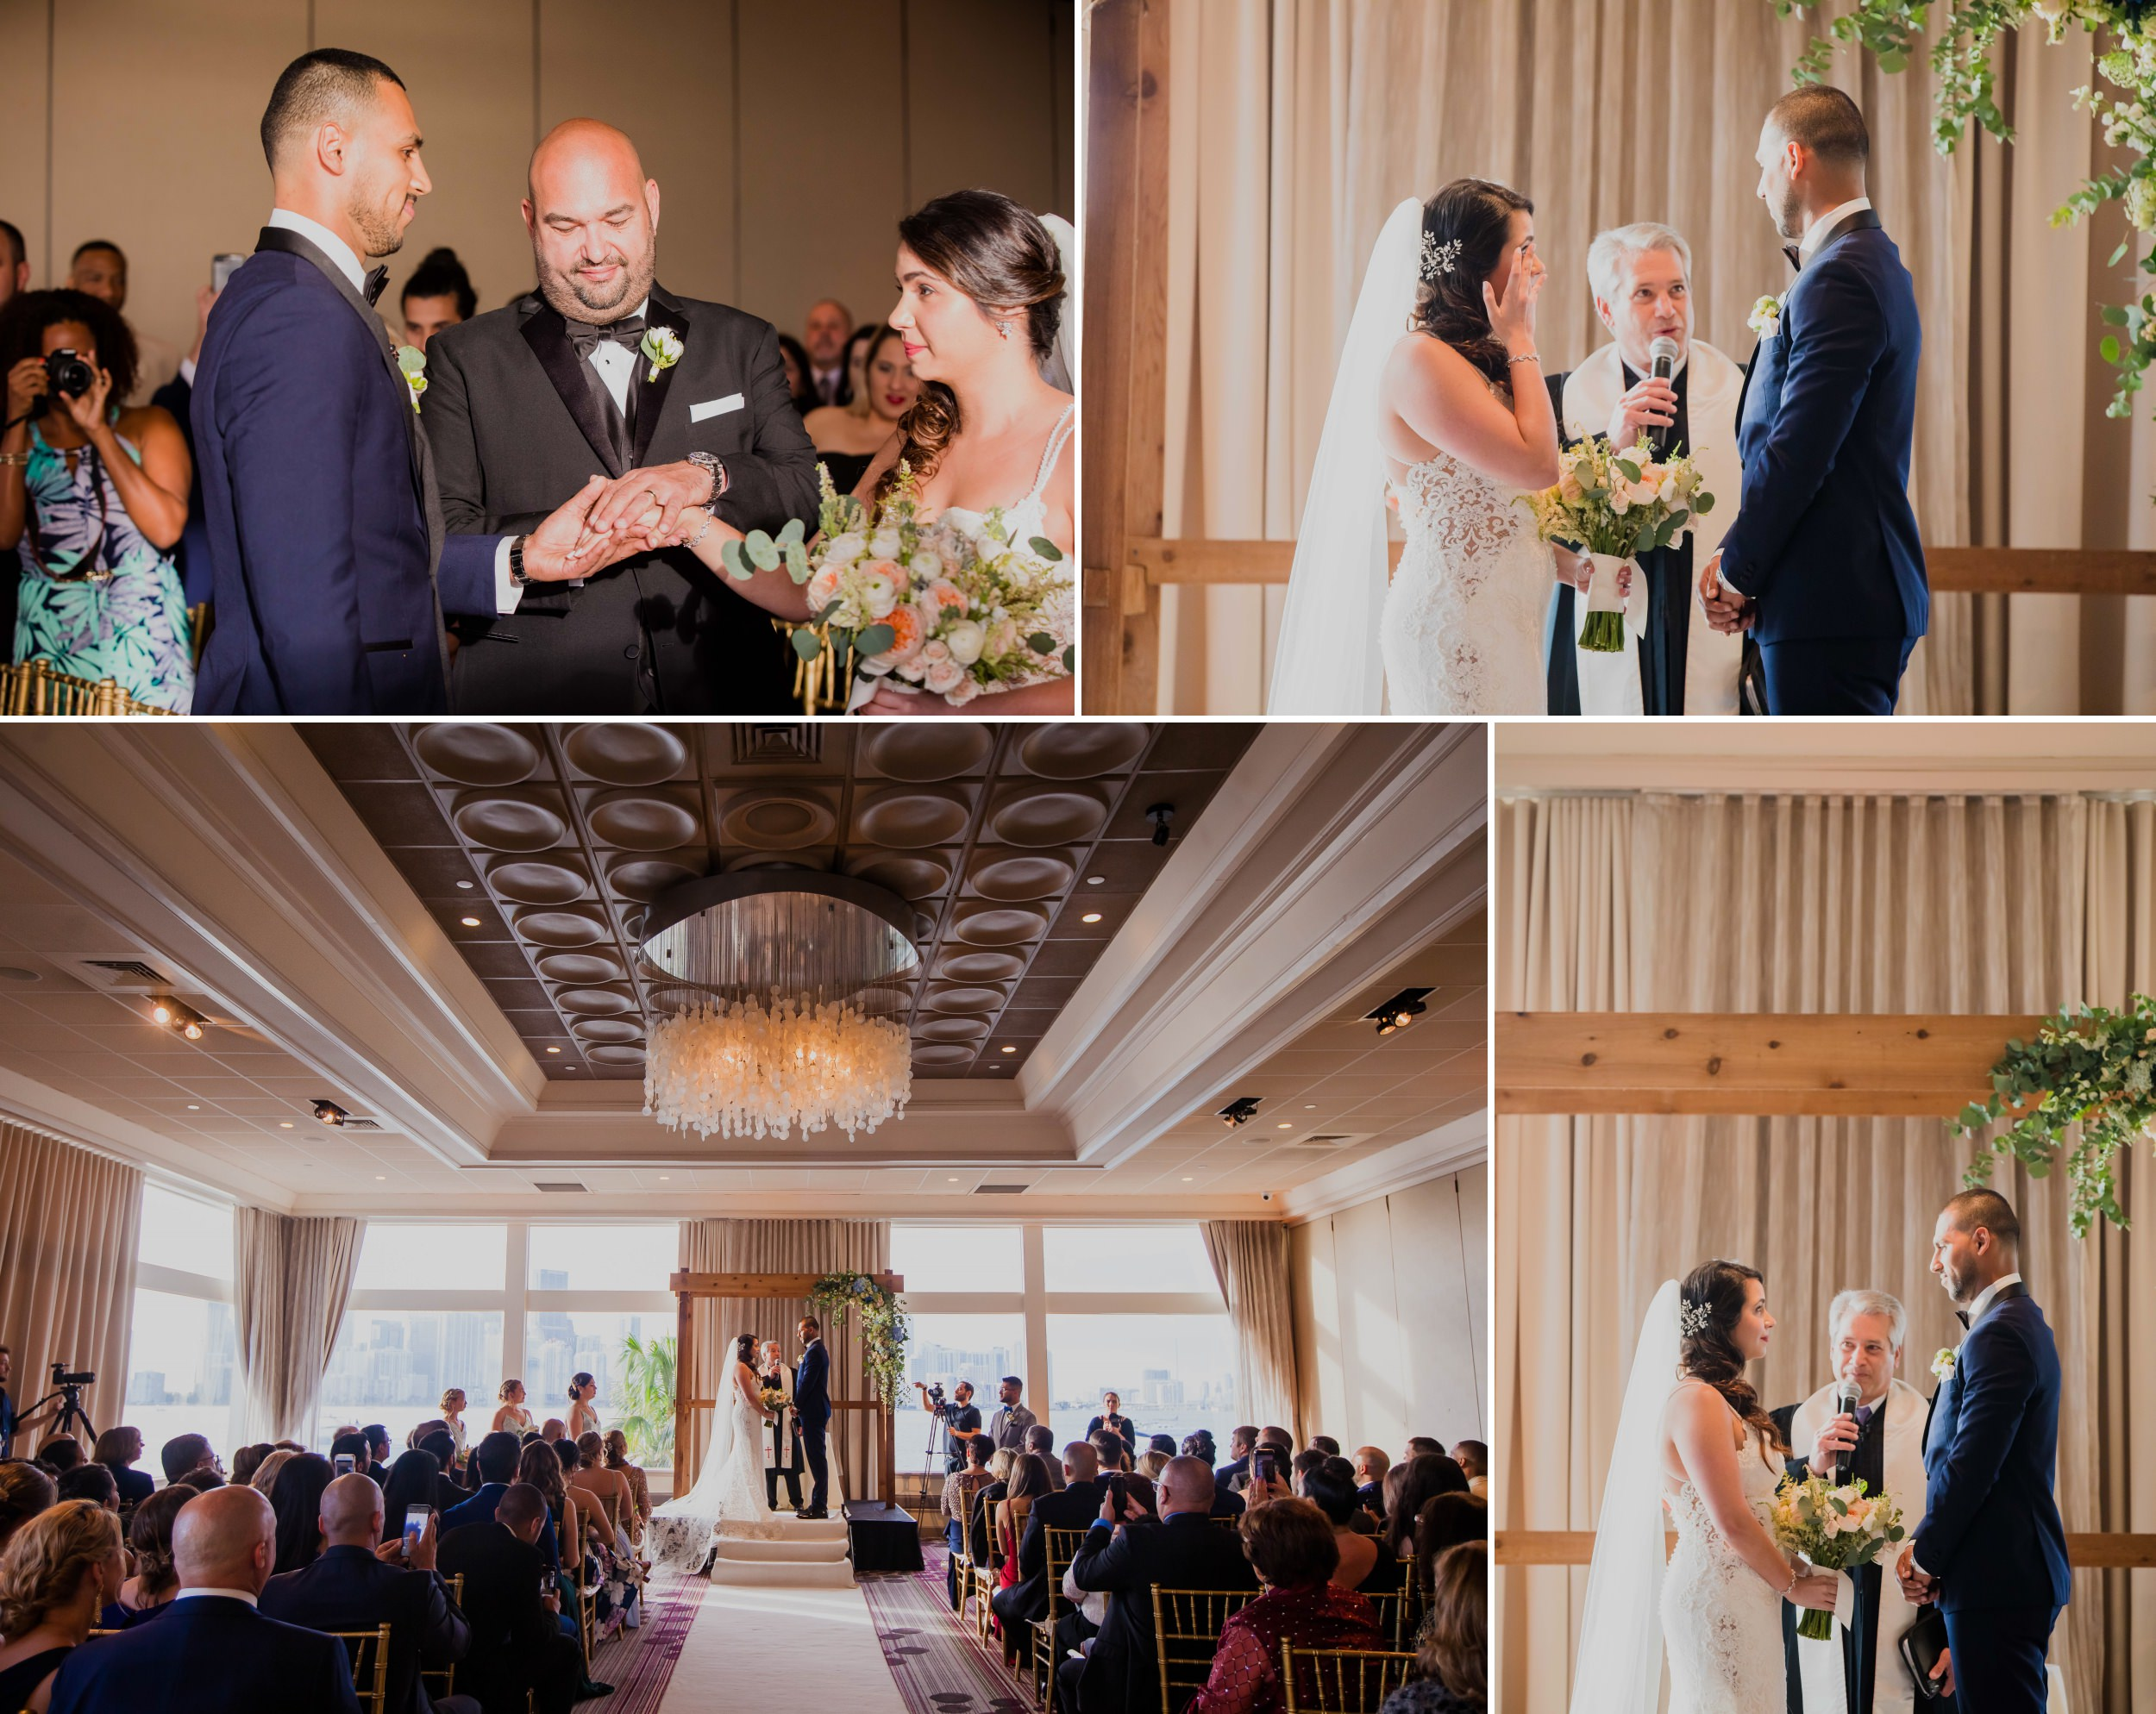 Wedding - Rusty Pelican - Key Biscayne - Santy Martinez Photography 29.jpg